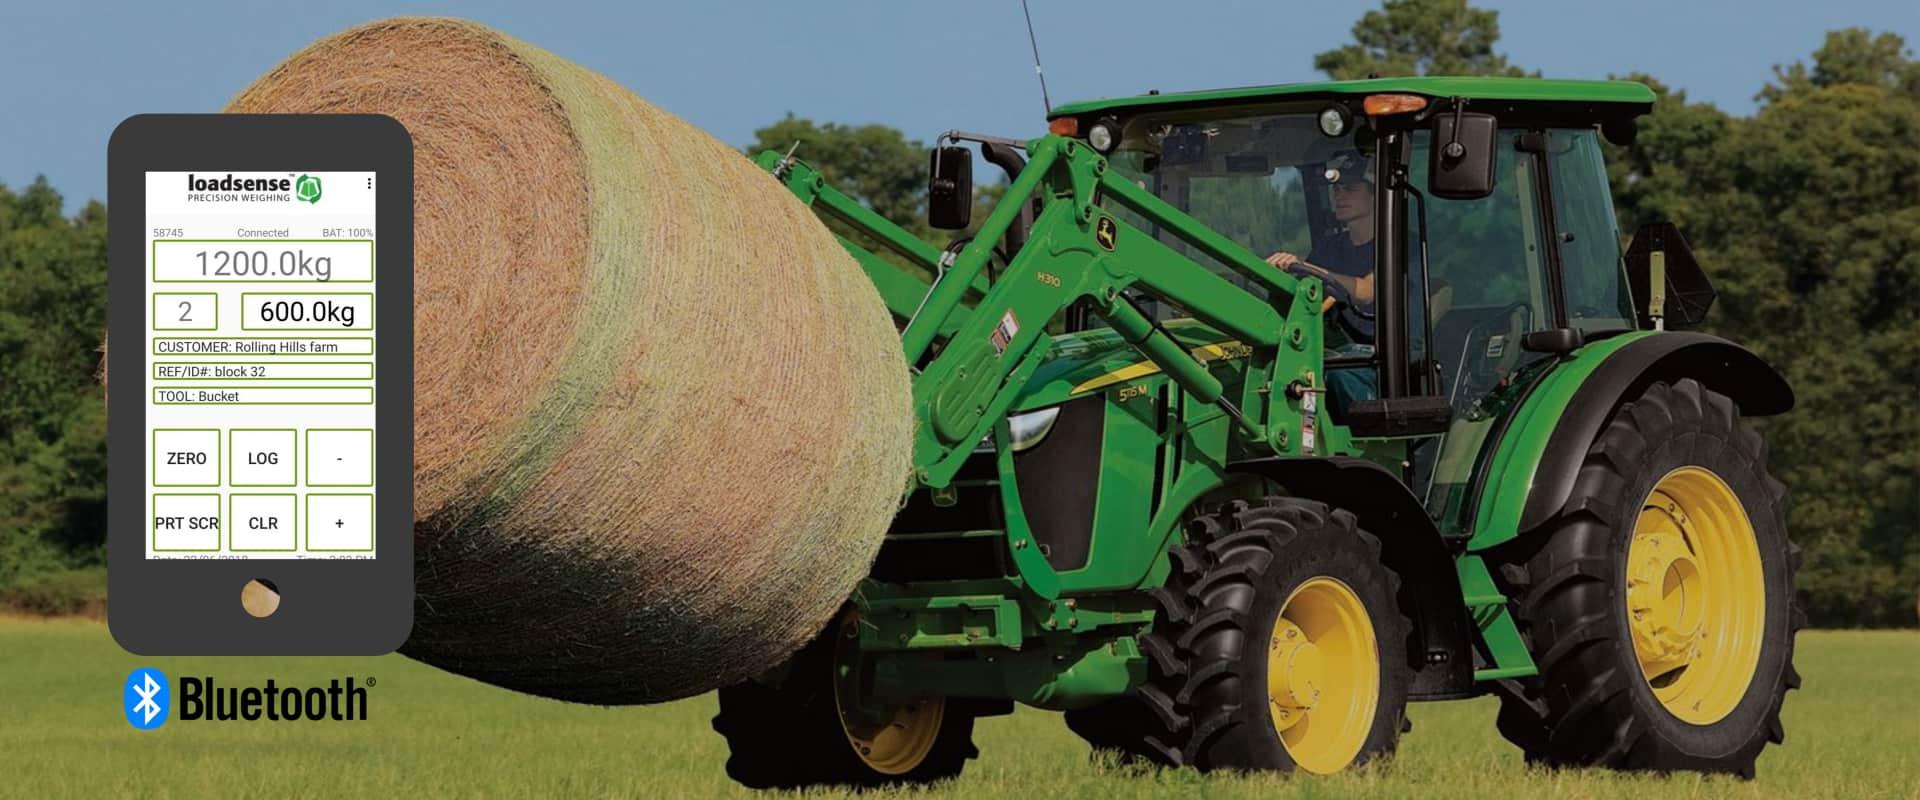 loadsense bluetooth tractor scale low cost worldwide